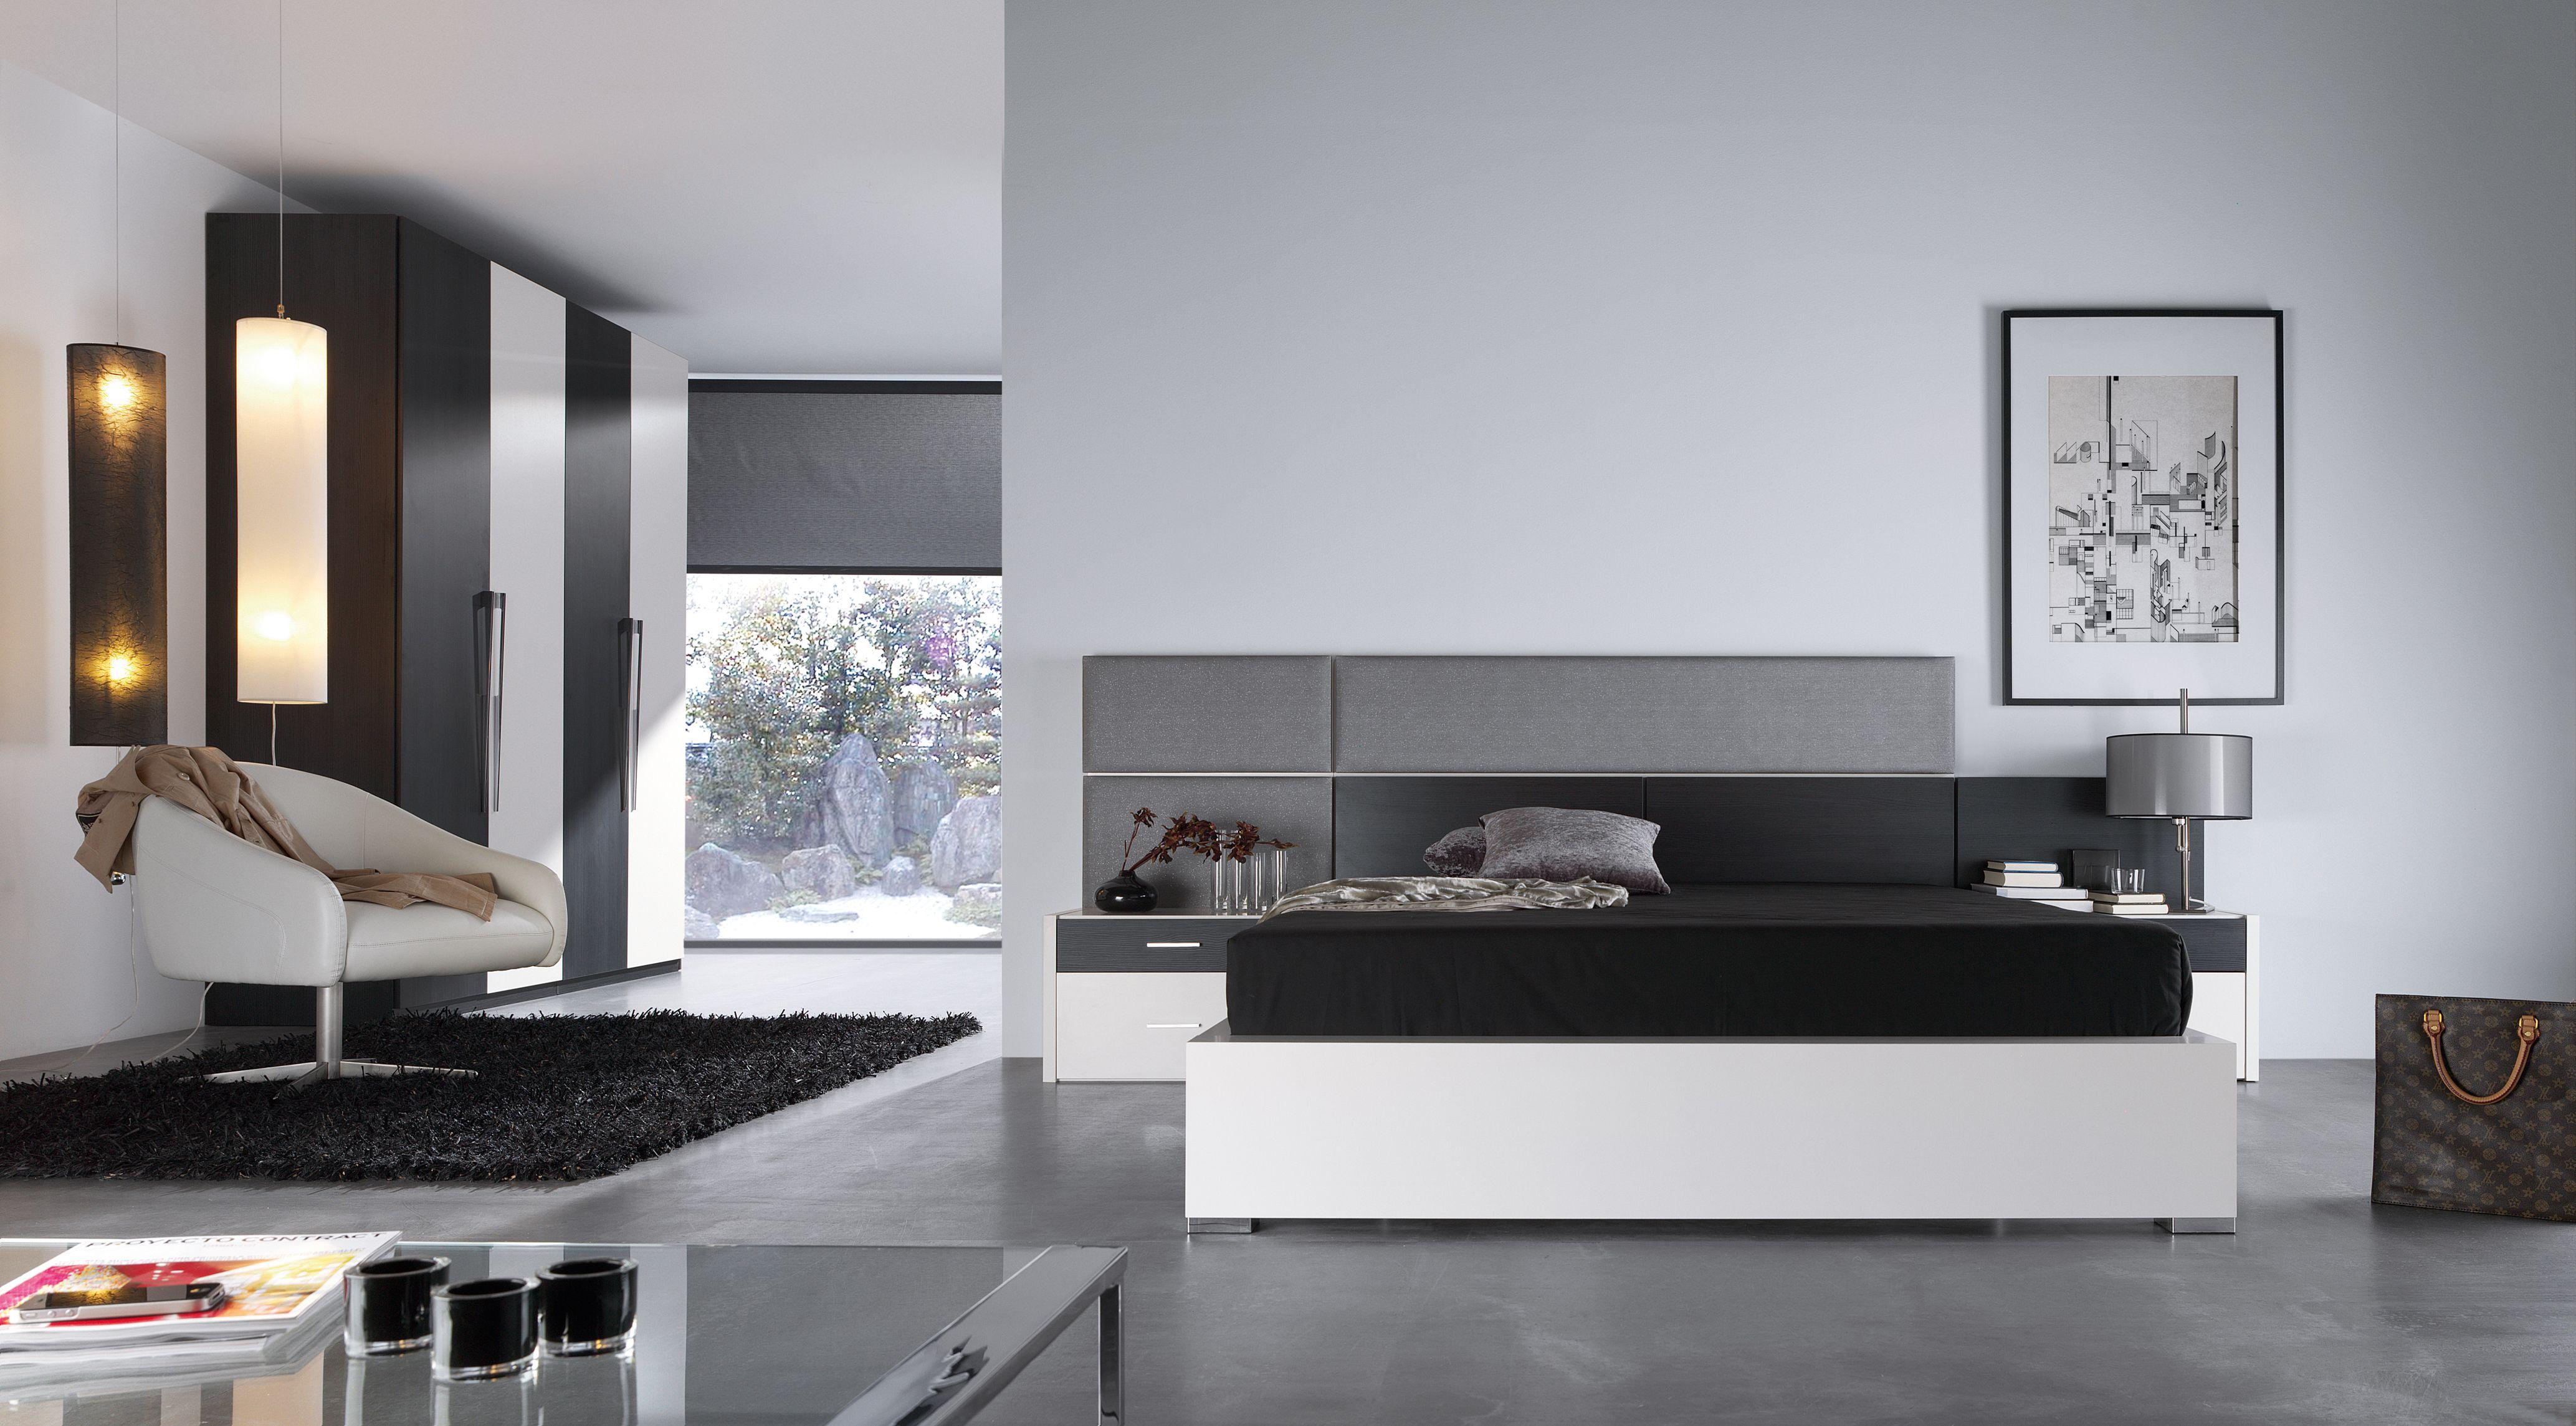 Dormitorio de matrimonio modelo abie habitaciones for Muebles habitaciones matrimonio